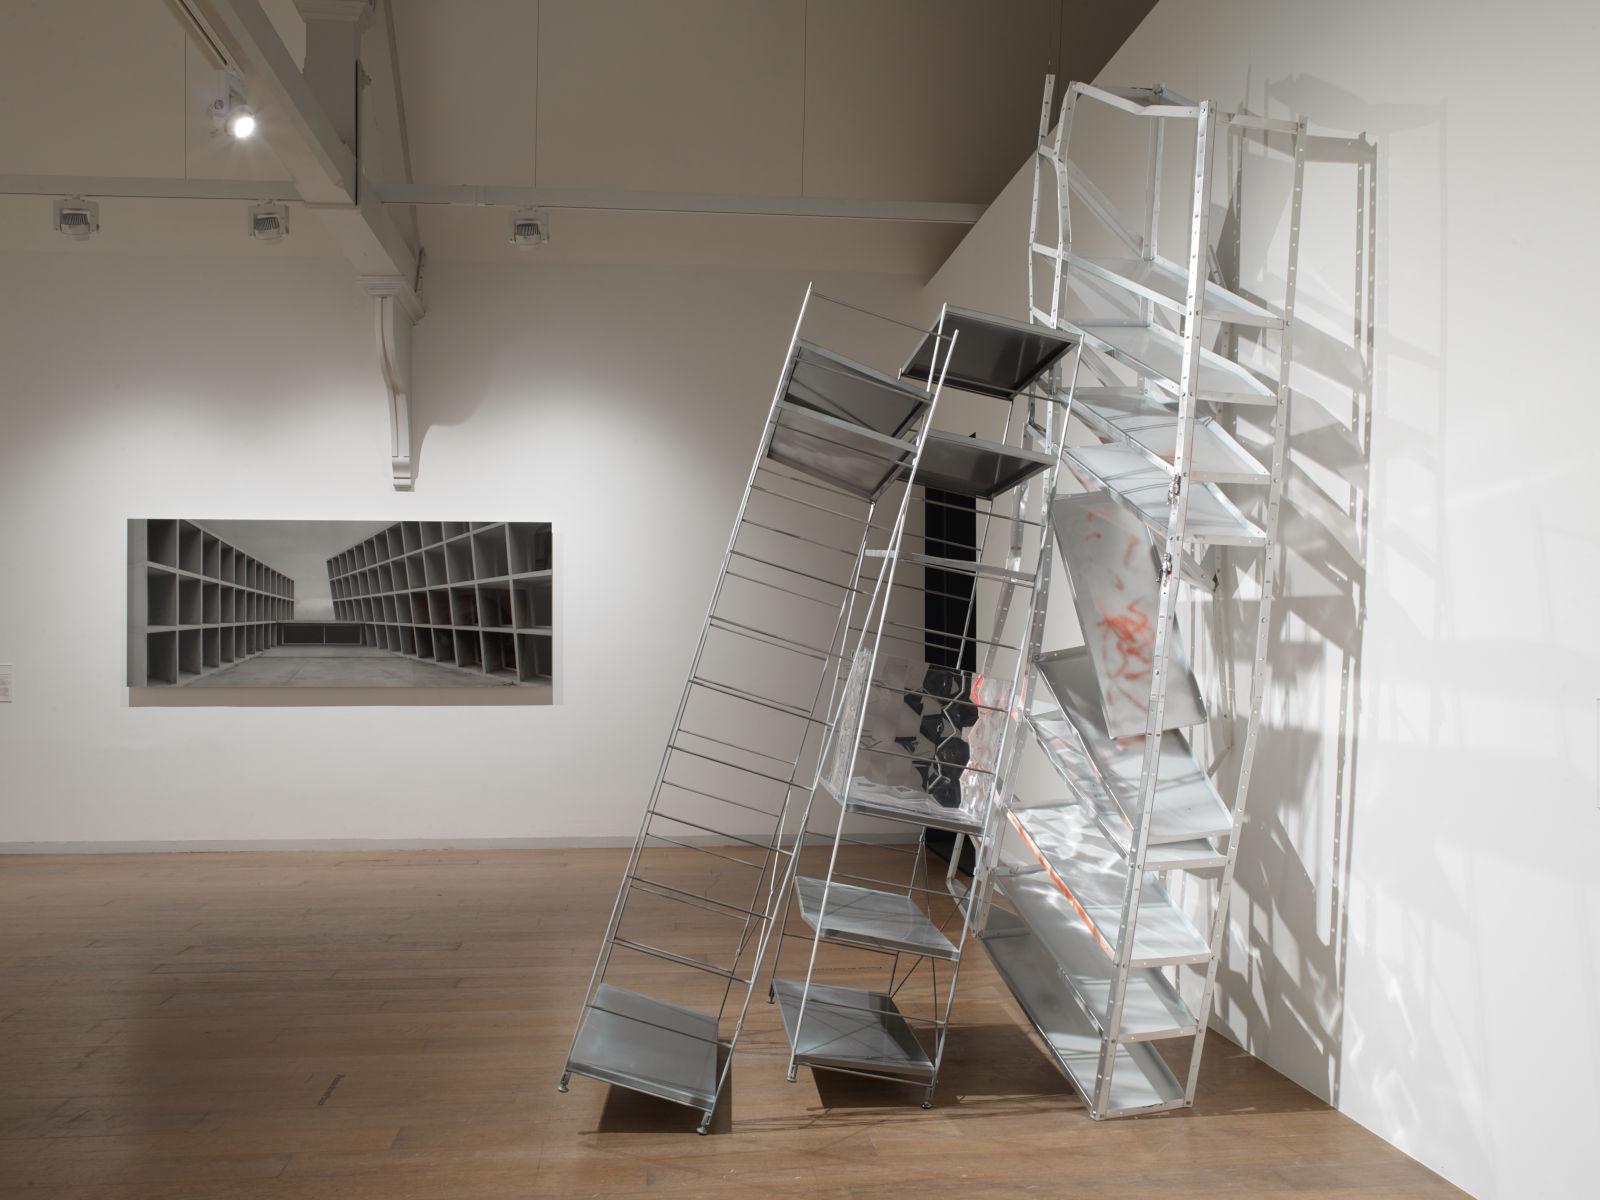 Whitechapel Gallery la Caixa Tom McCarthy 1